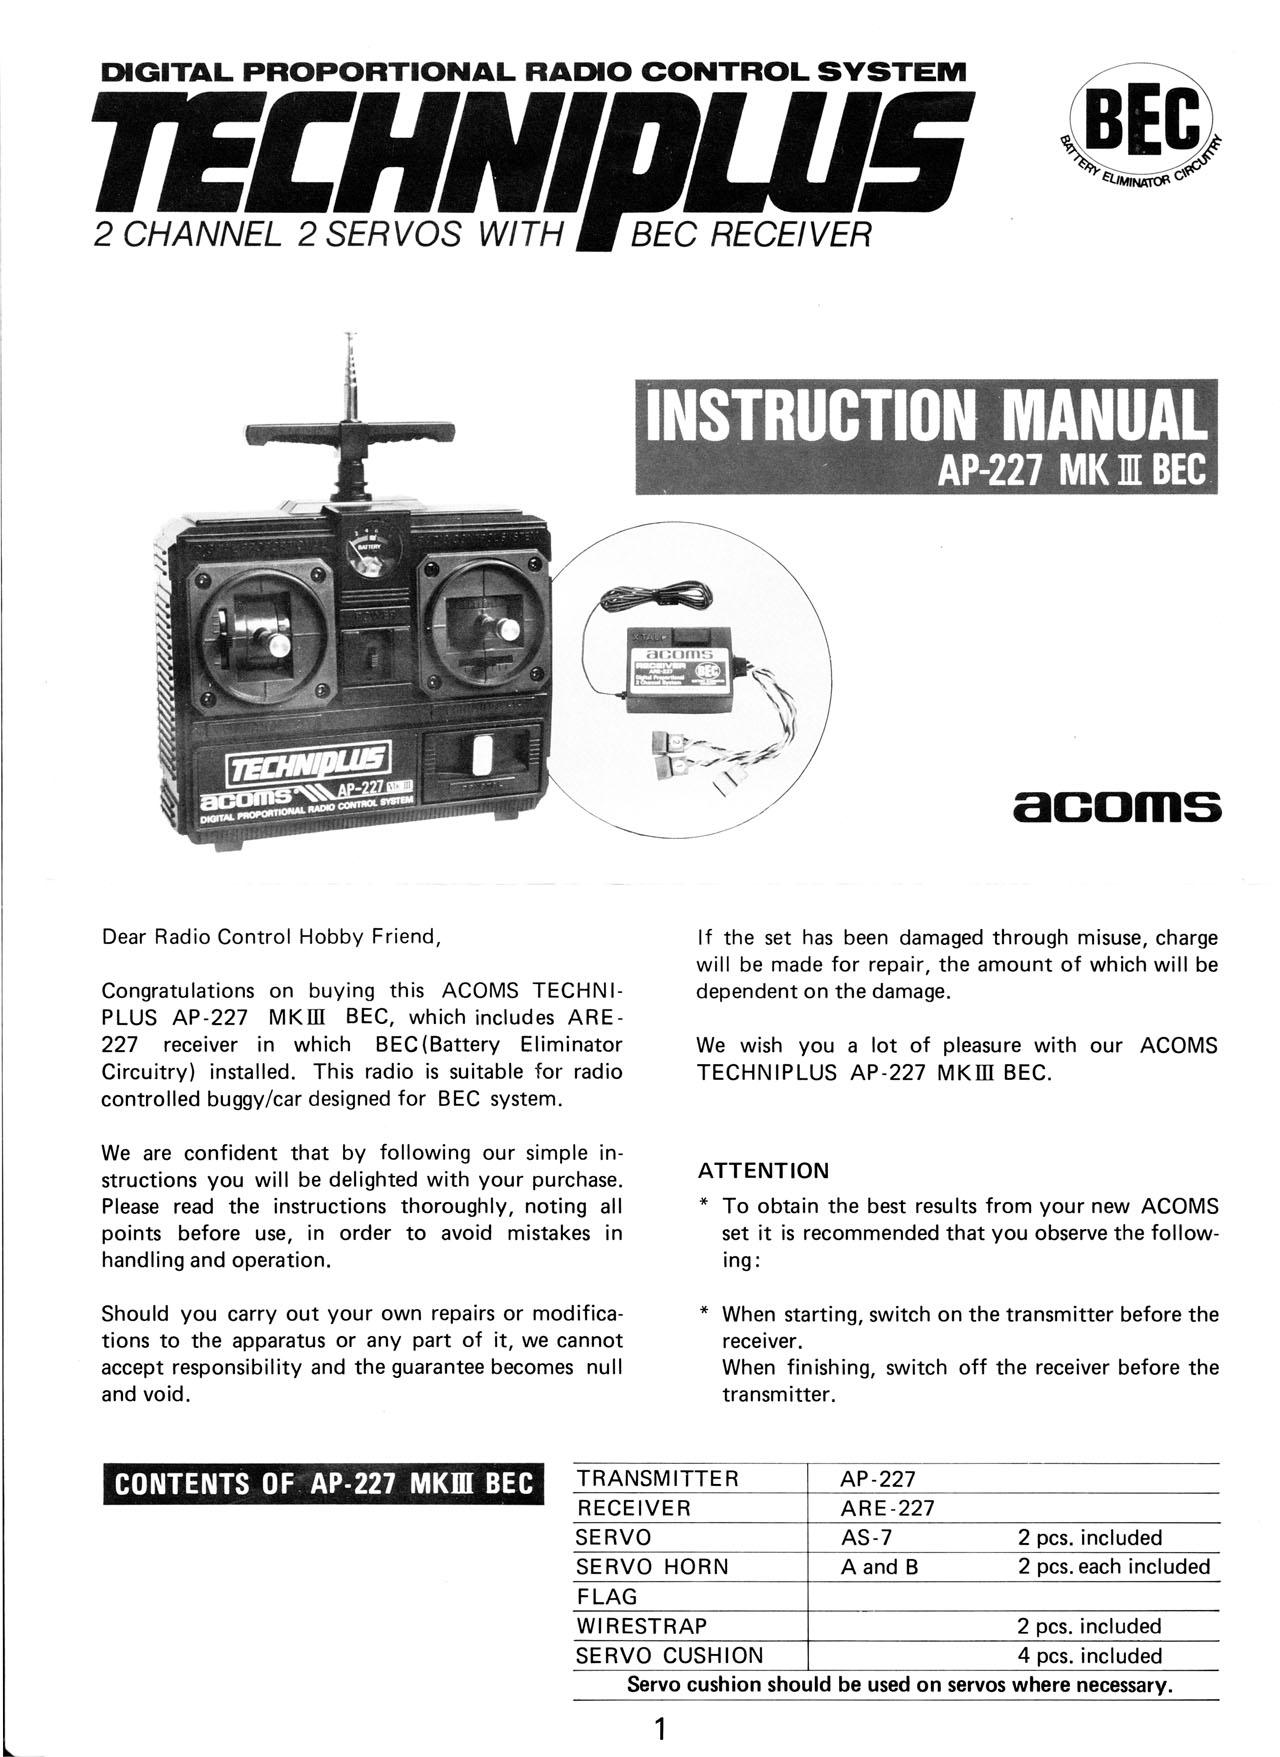 Acoms Ap227 Mk3 Manual Bec Version Here Vintage Tamiya Battery Eliminator Circuitry Rc Dictionary Post 6936 1261709270 Thumb